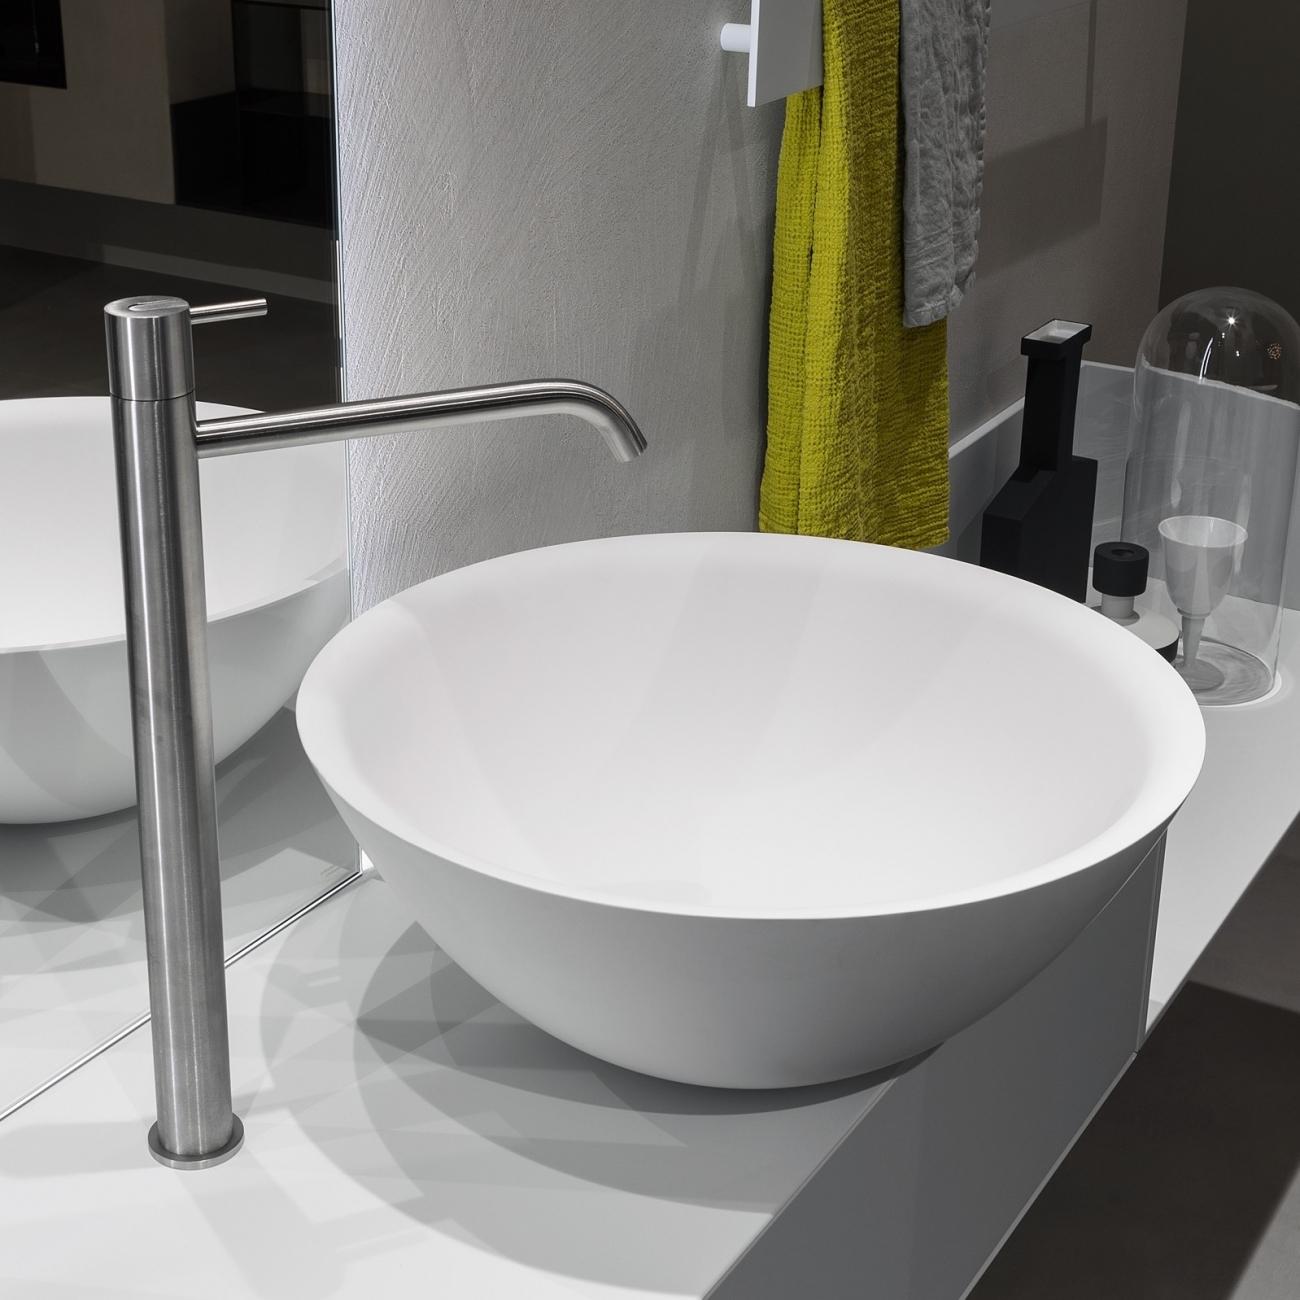 TONDOMOOD Antonio Lupi Flummod Sink